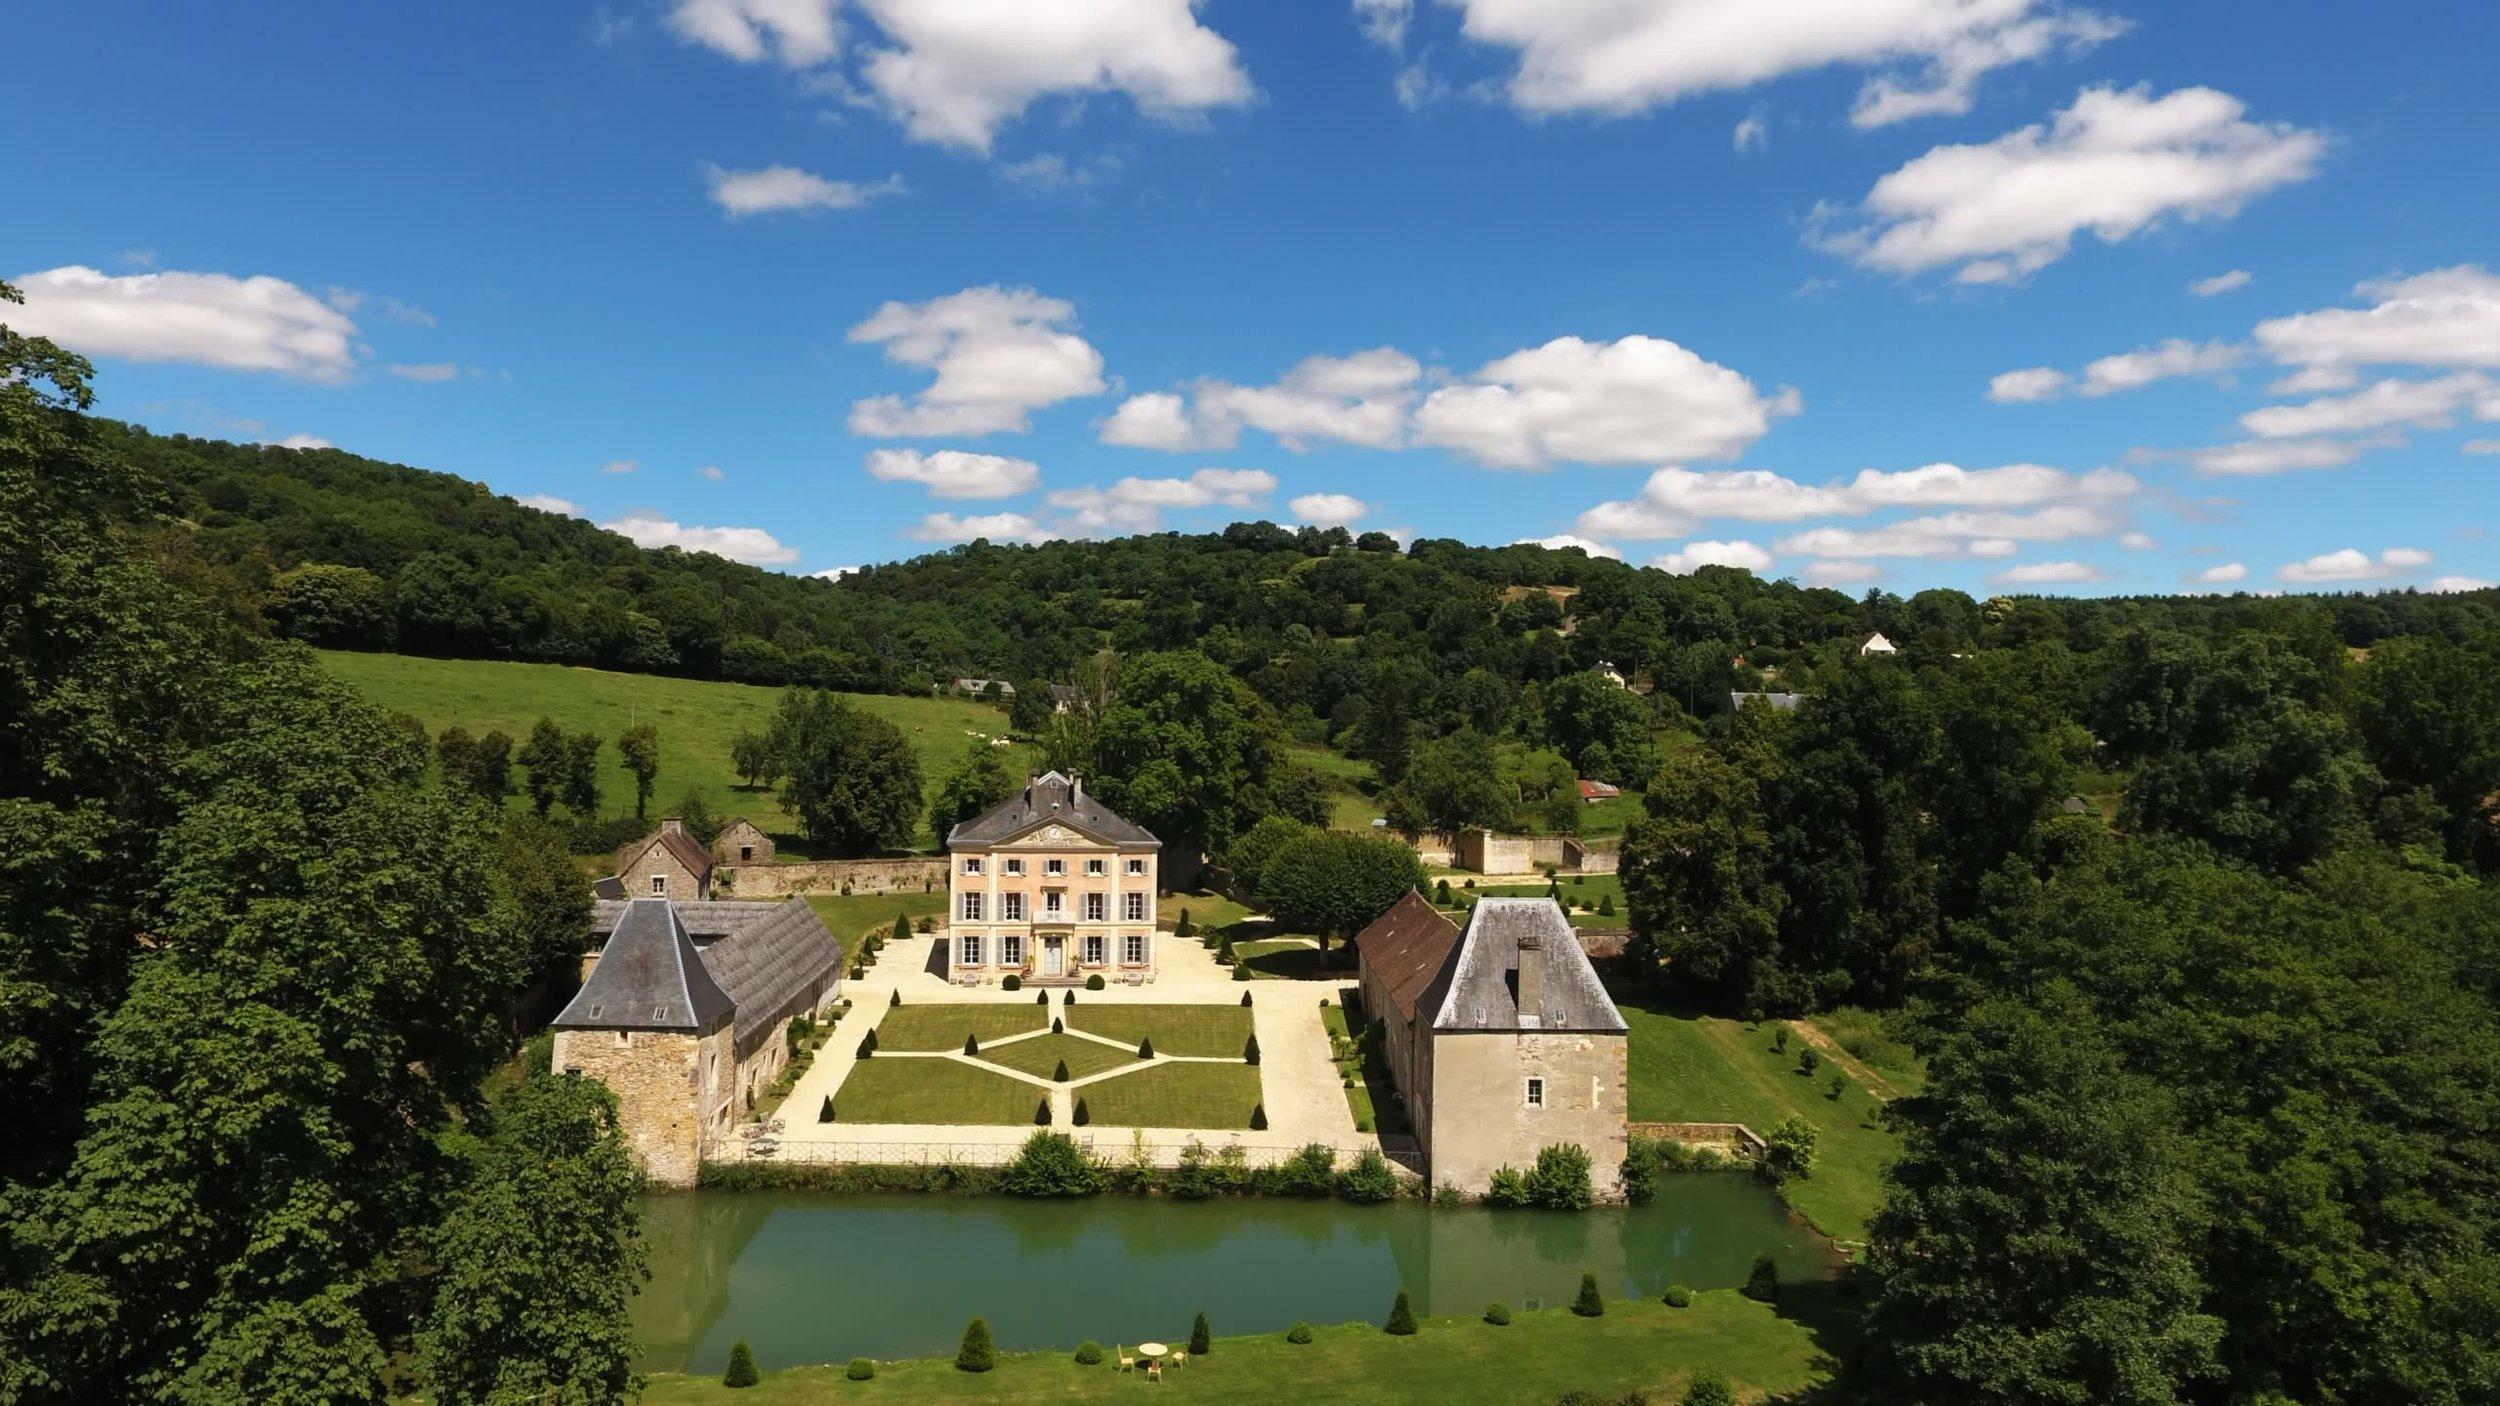 Chateau de la Pommeraye - charming boutique hotel chateau b&b spa normandy calvados(2).jpg